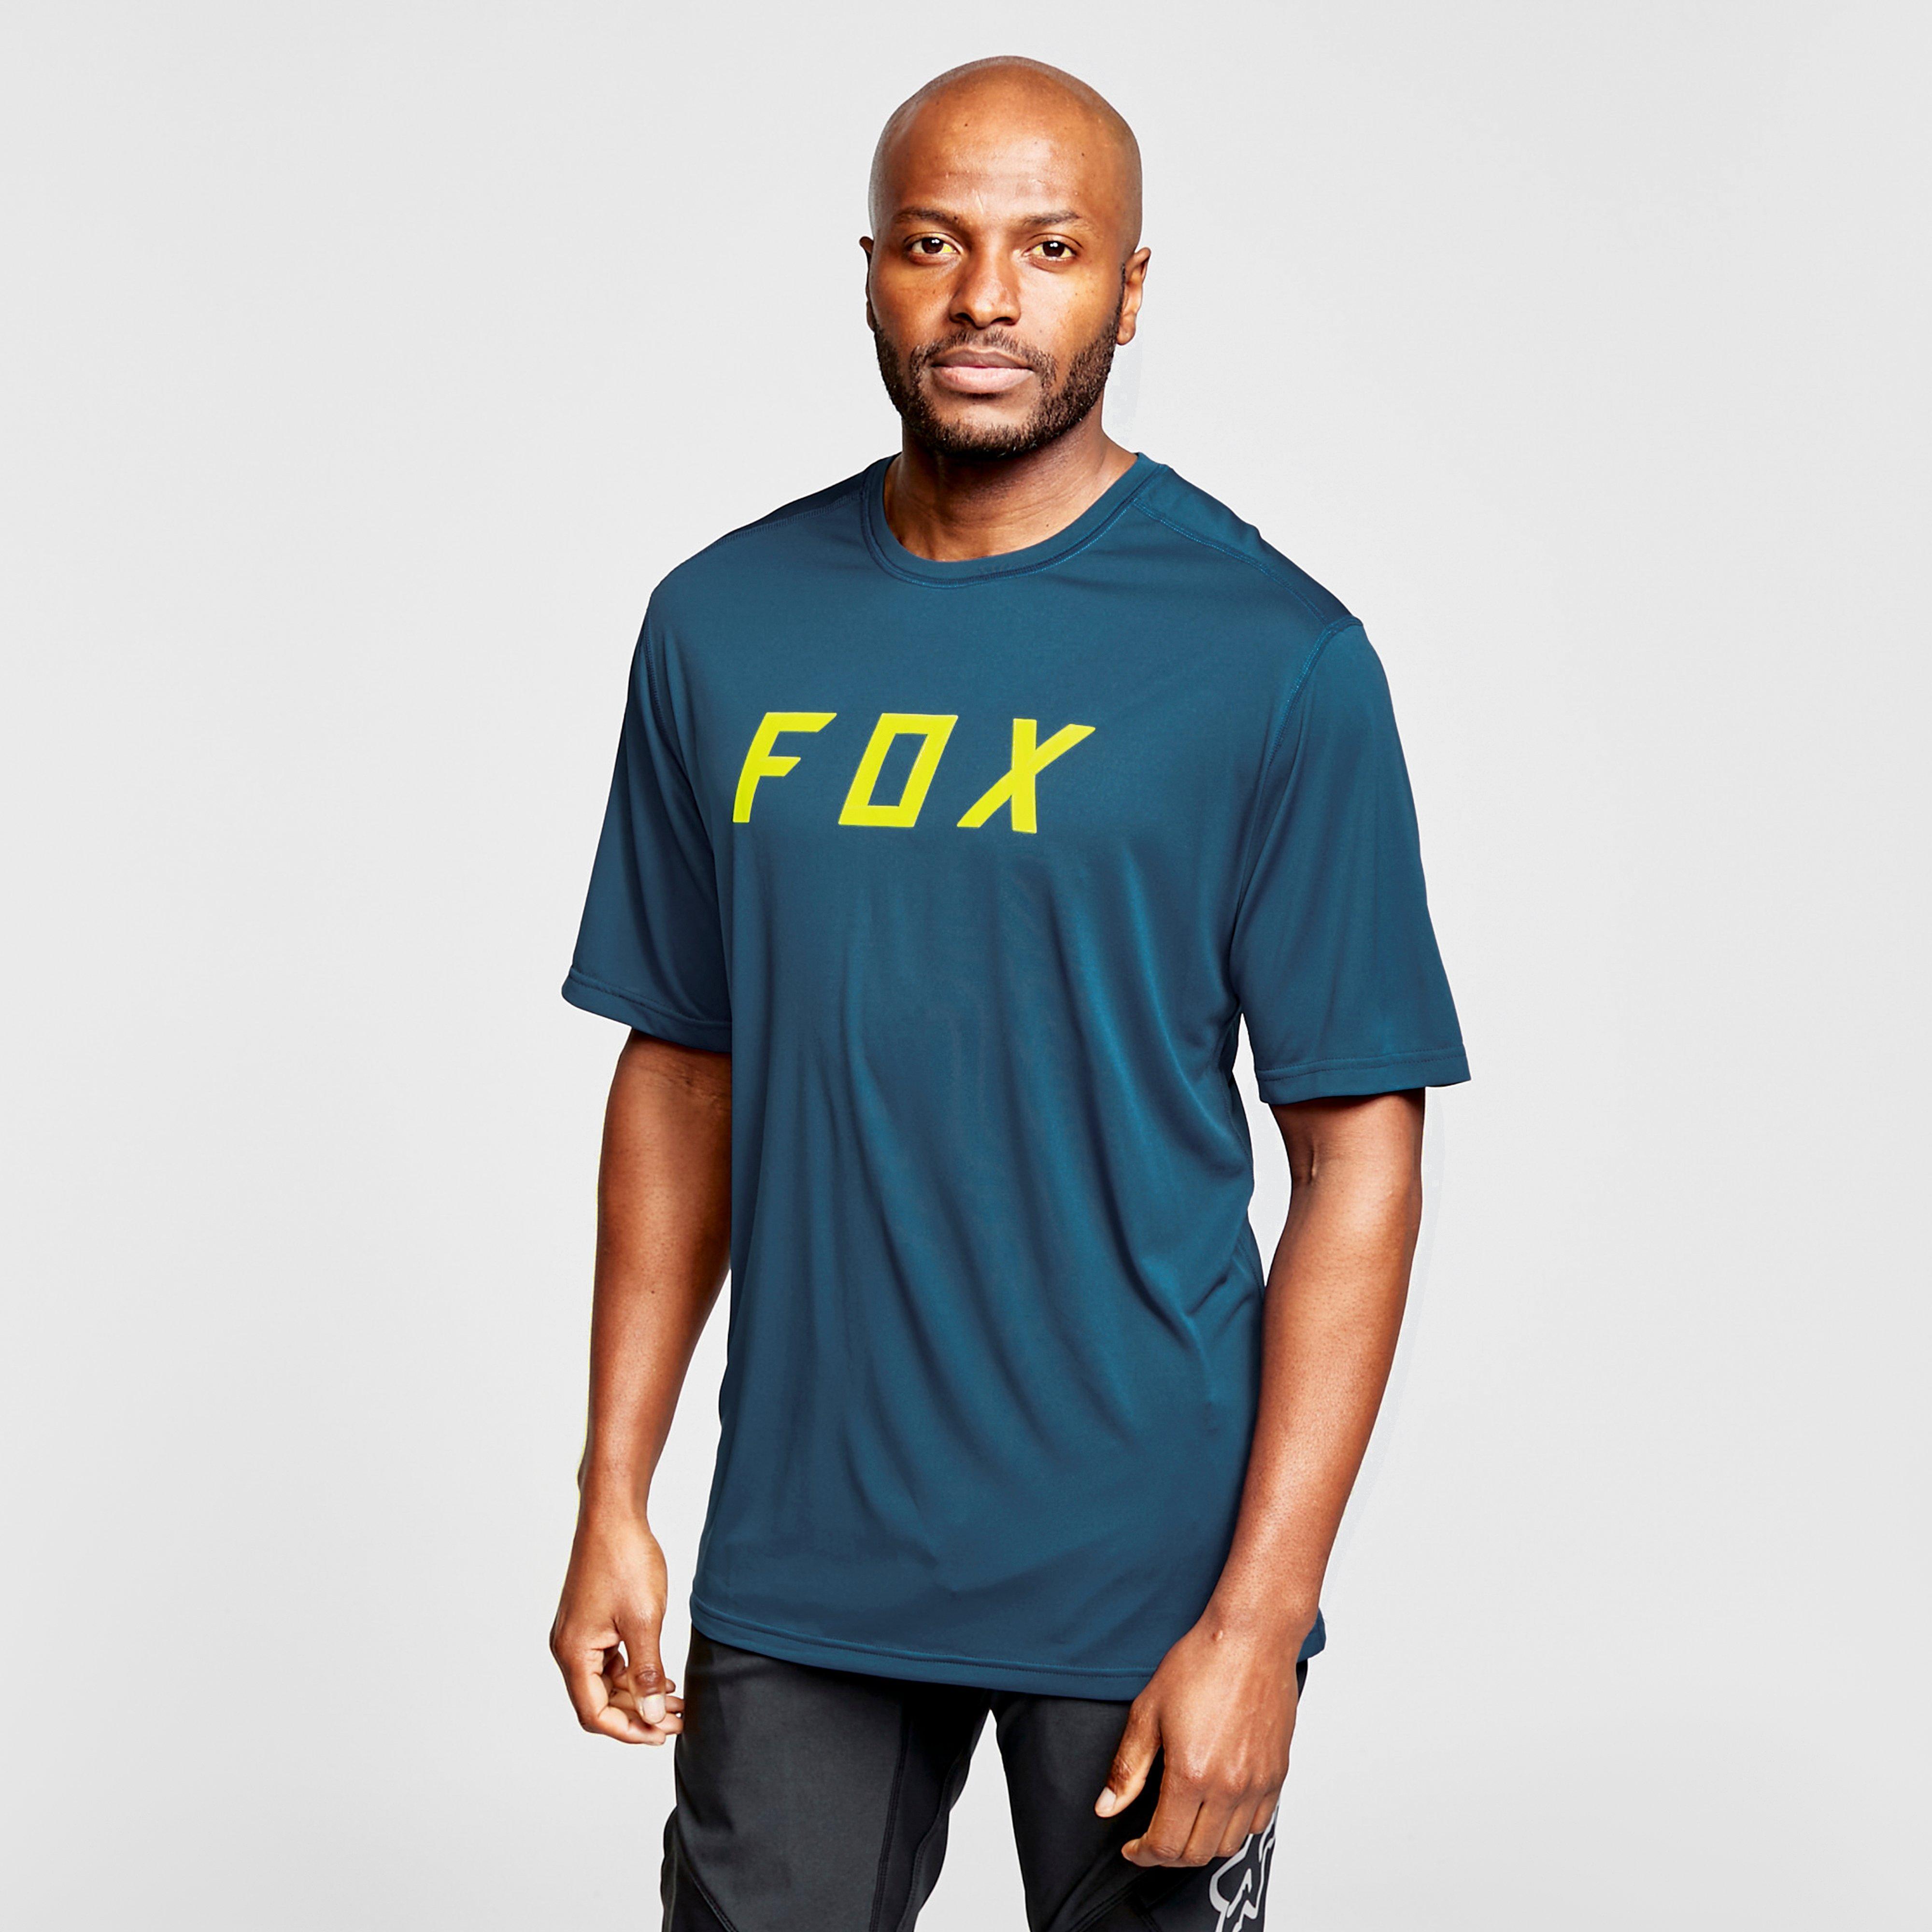 Image of Fox Men's Ranger Short-Sleeve Jersey - Blue/Yellow, BLUE/YELLOW